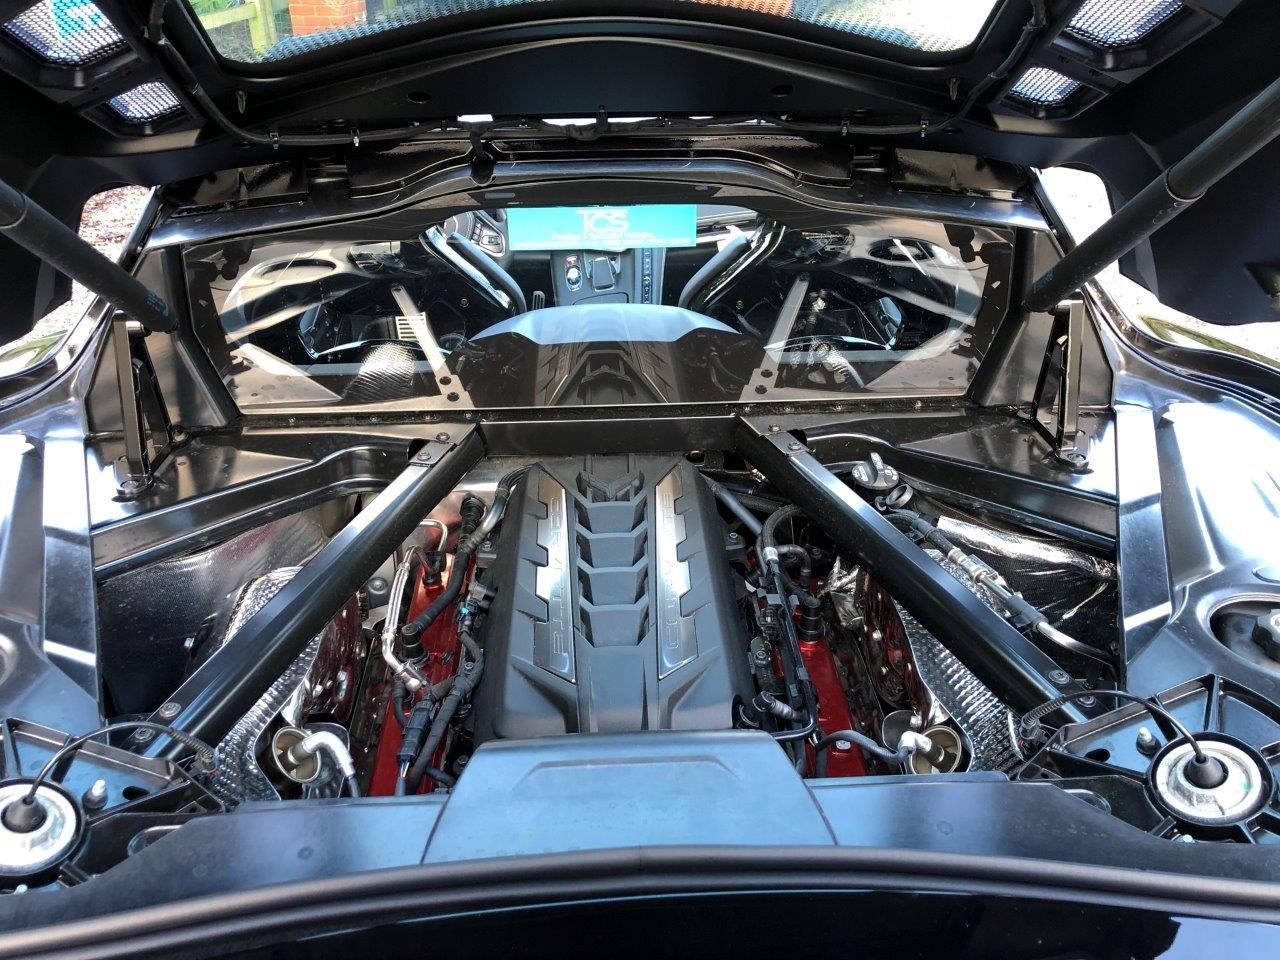 2020 Chevrolet Corvette C8 Z51 Stingray 3LT Coupe For Sale (picture 12 of 12)